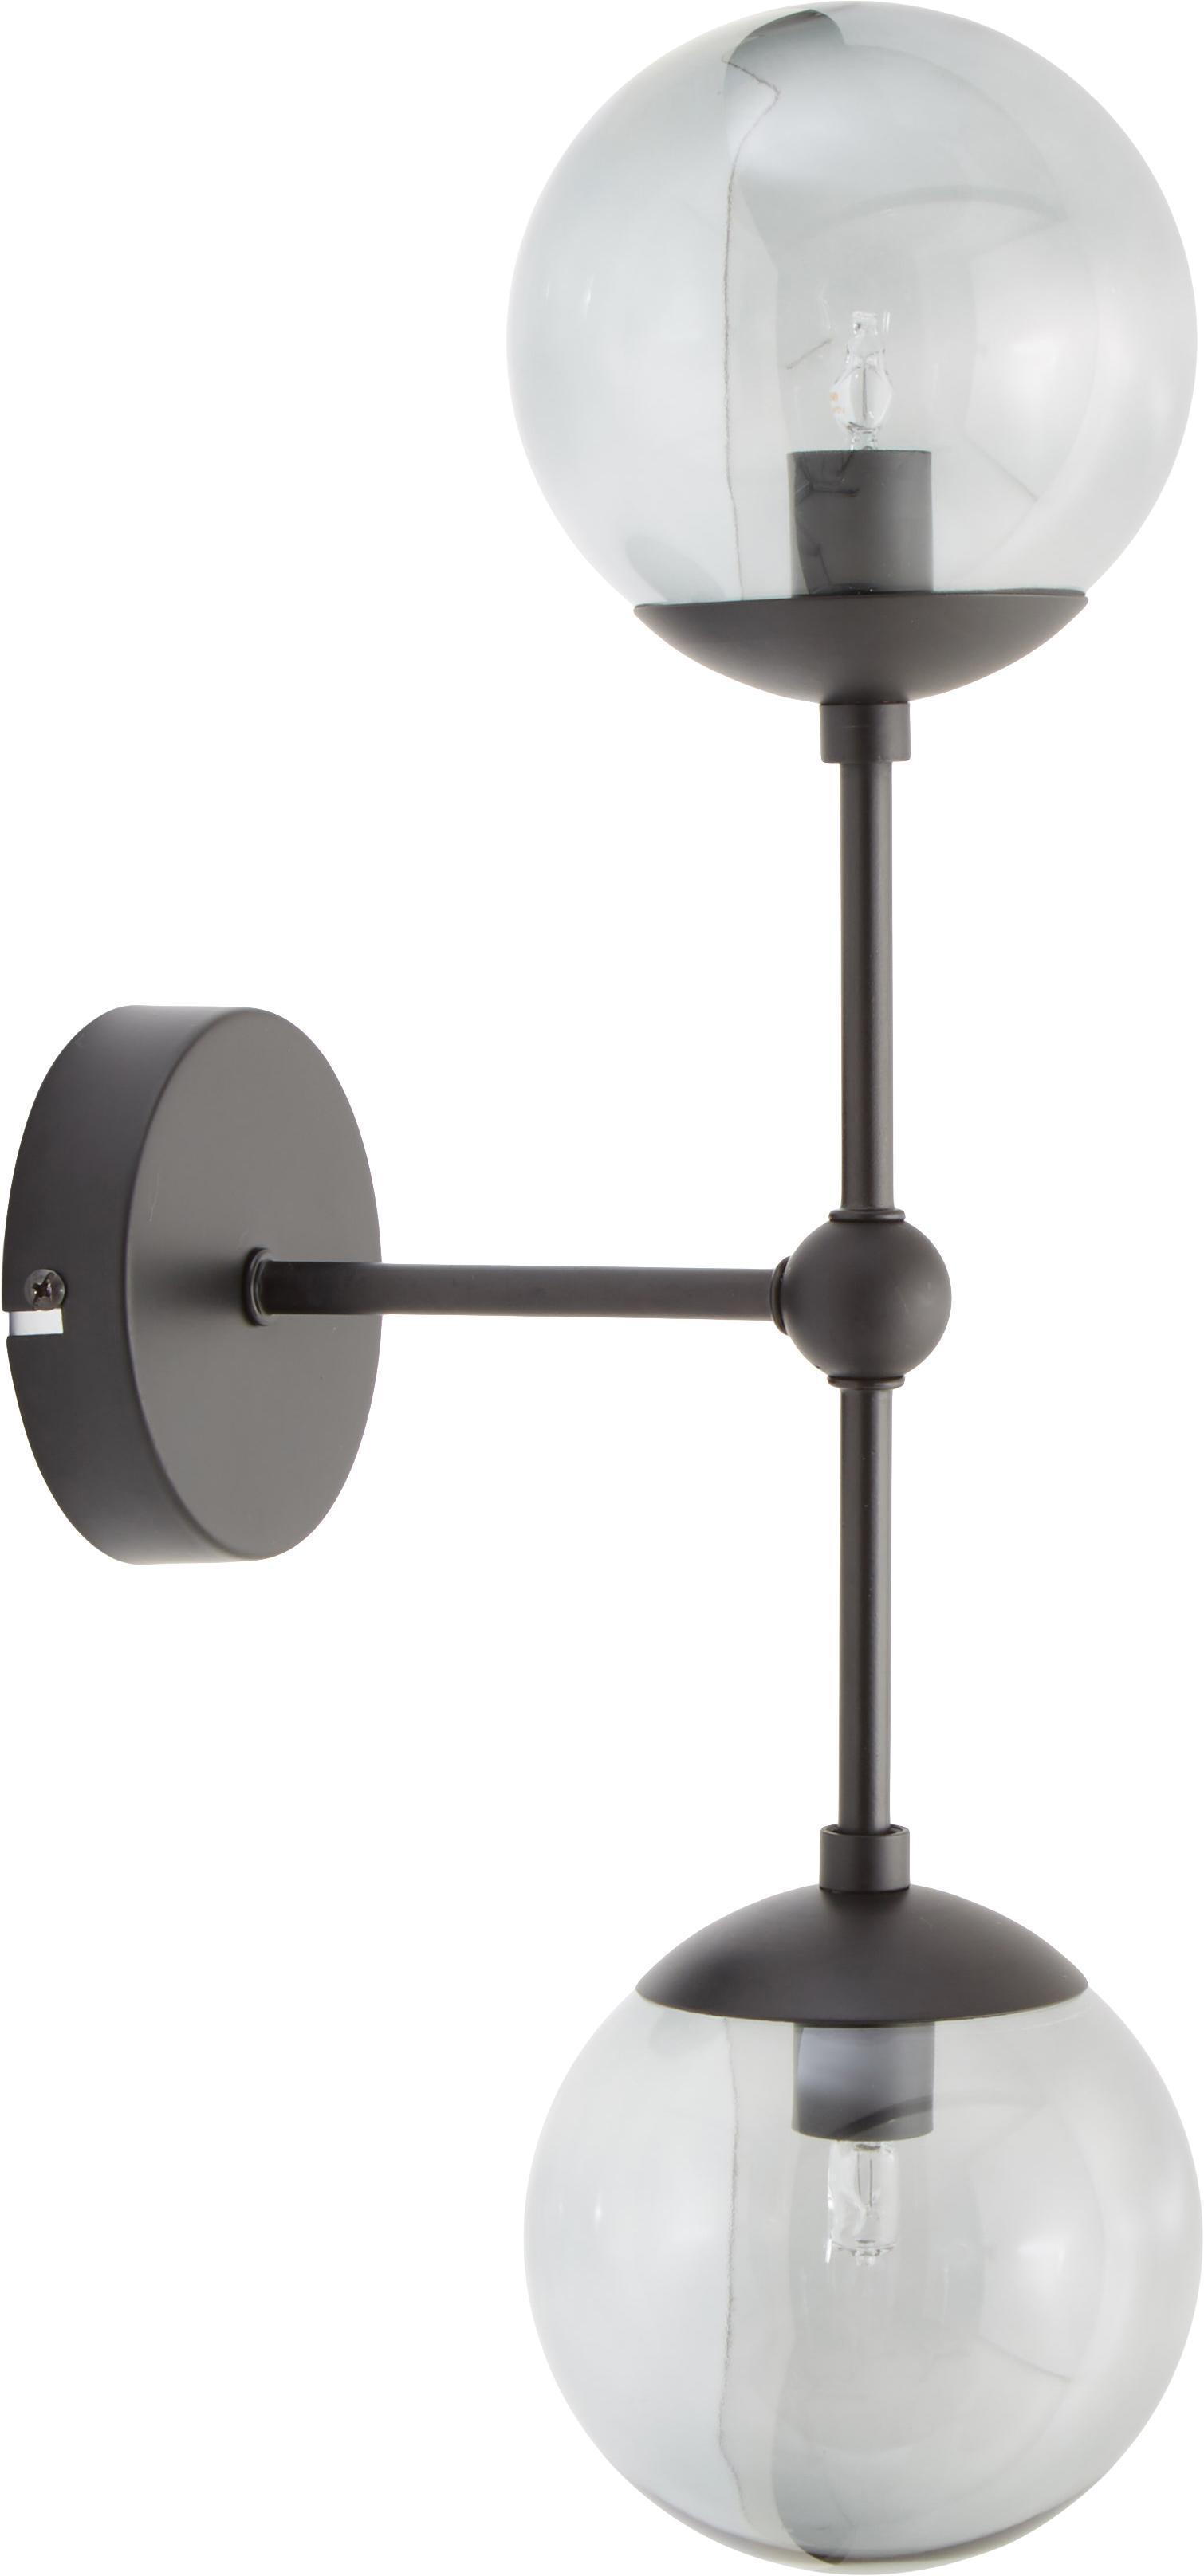 Wandlamp Beth, Lampenkap: glas, Grijs, zwart, Ø 12 x H 45 cm